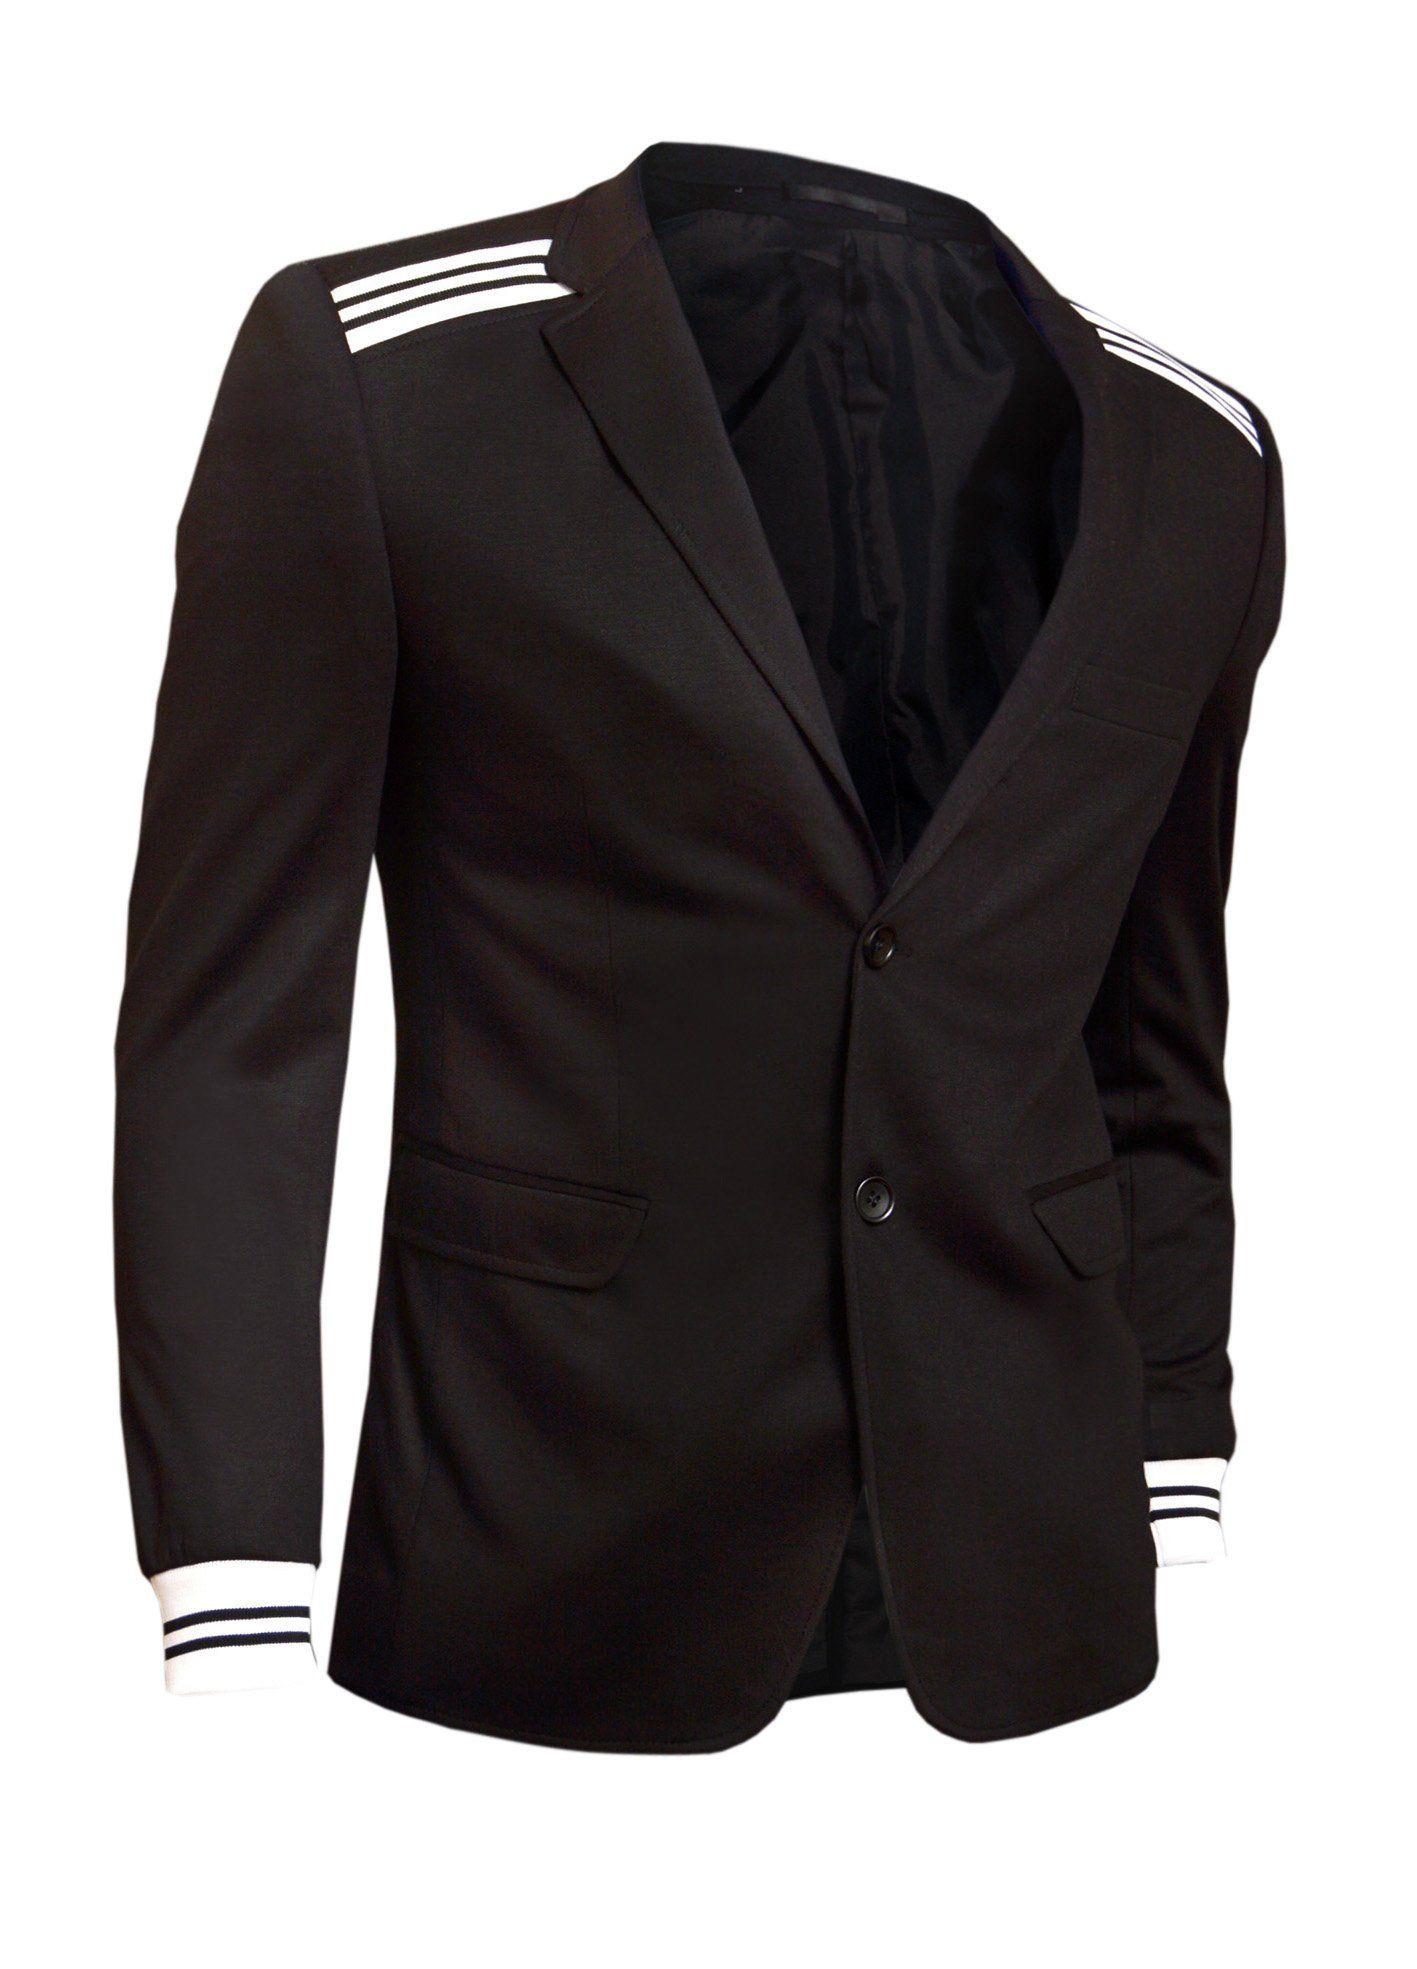 D&R Fashion Men's Welts Blazer Top Jacket Uk Size - Coat Black small